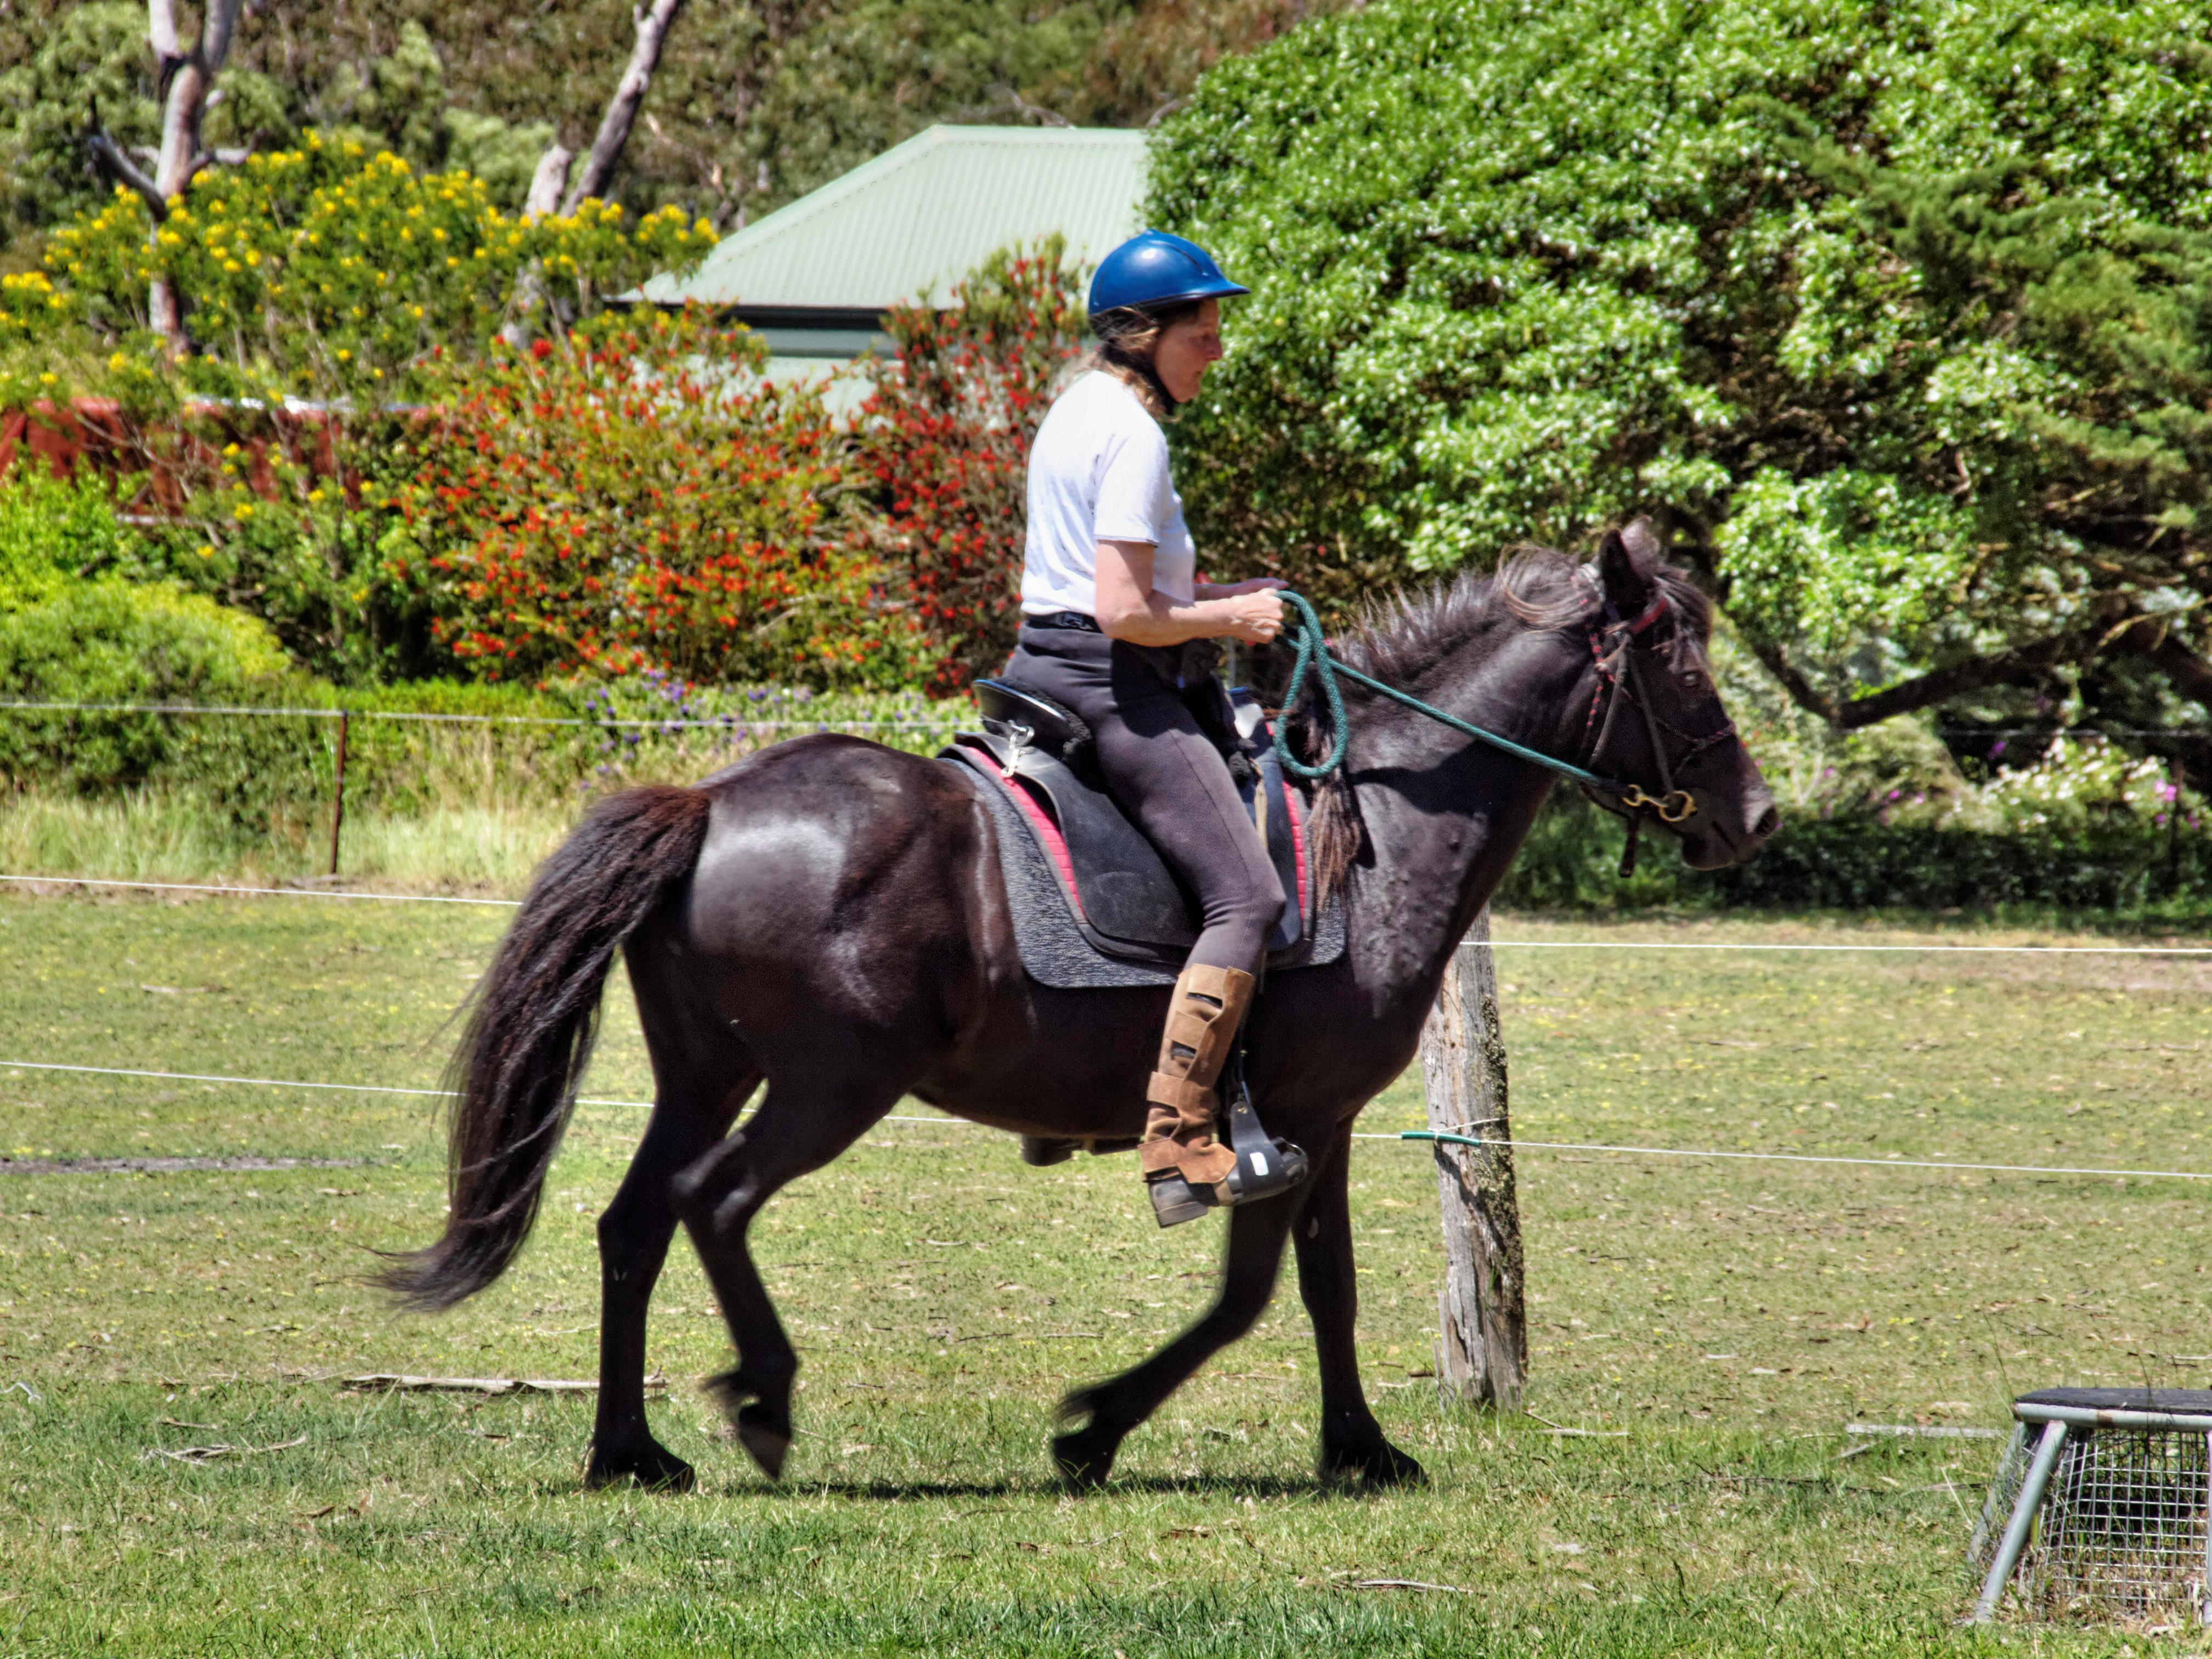 Riding-11.jpeg